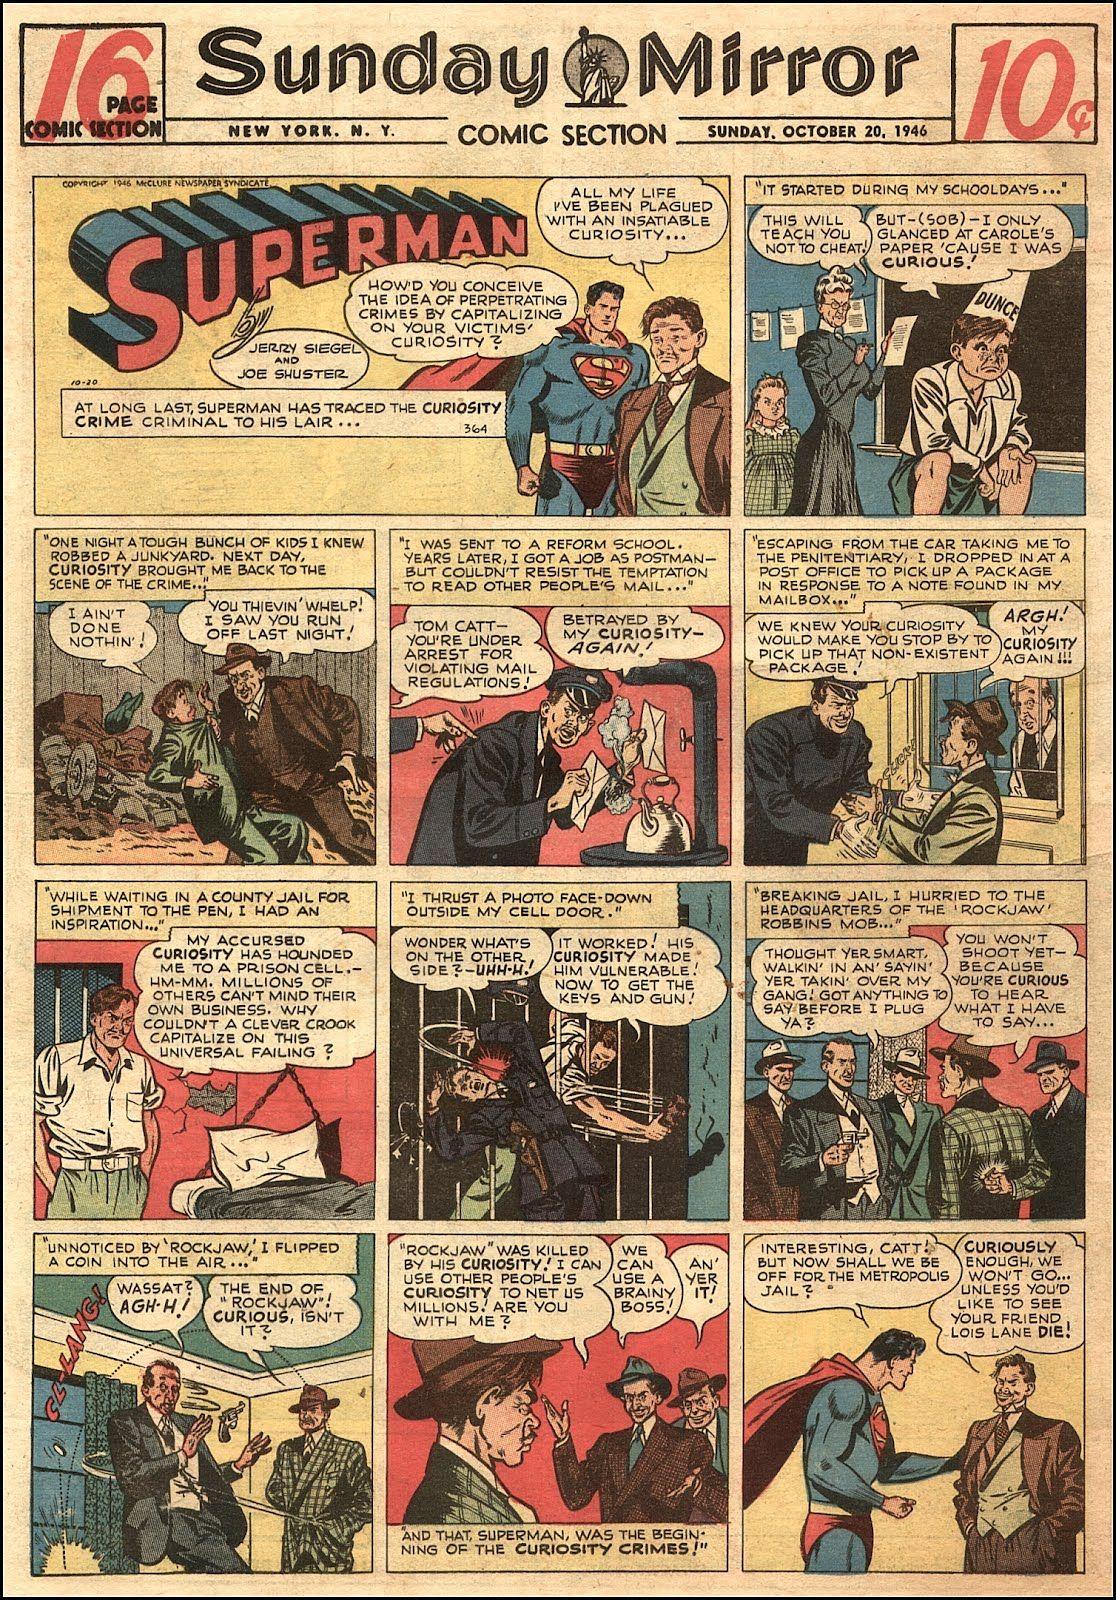 Superman comic http://goldenagecomicbookstories.blogspot.com/2012/02/superman-handful-of-sunday-strips-1945.html